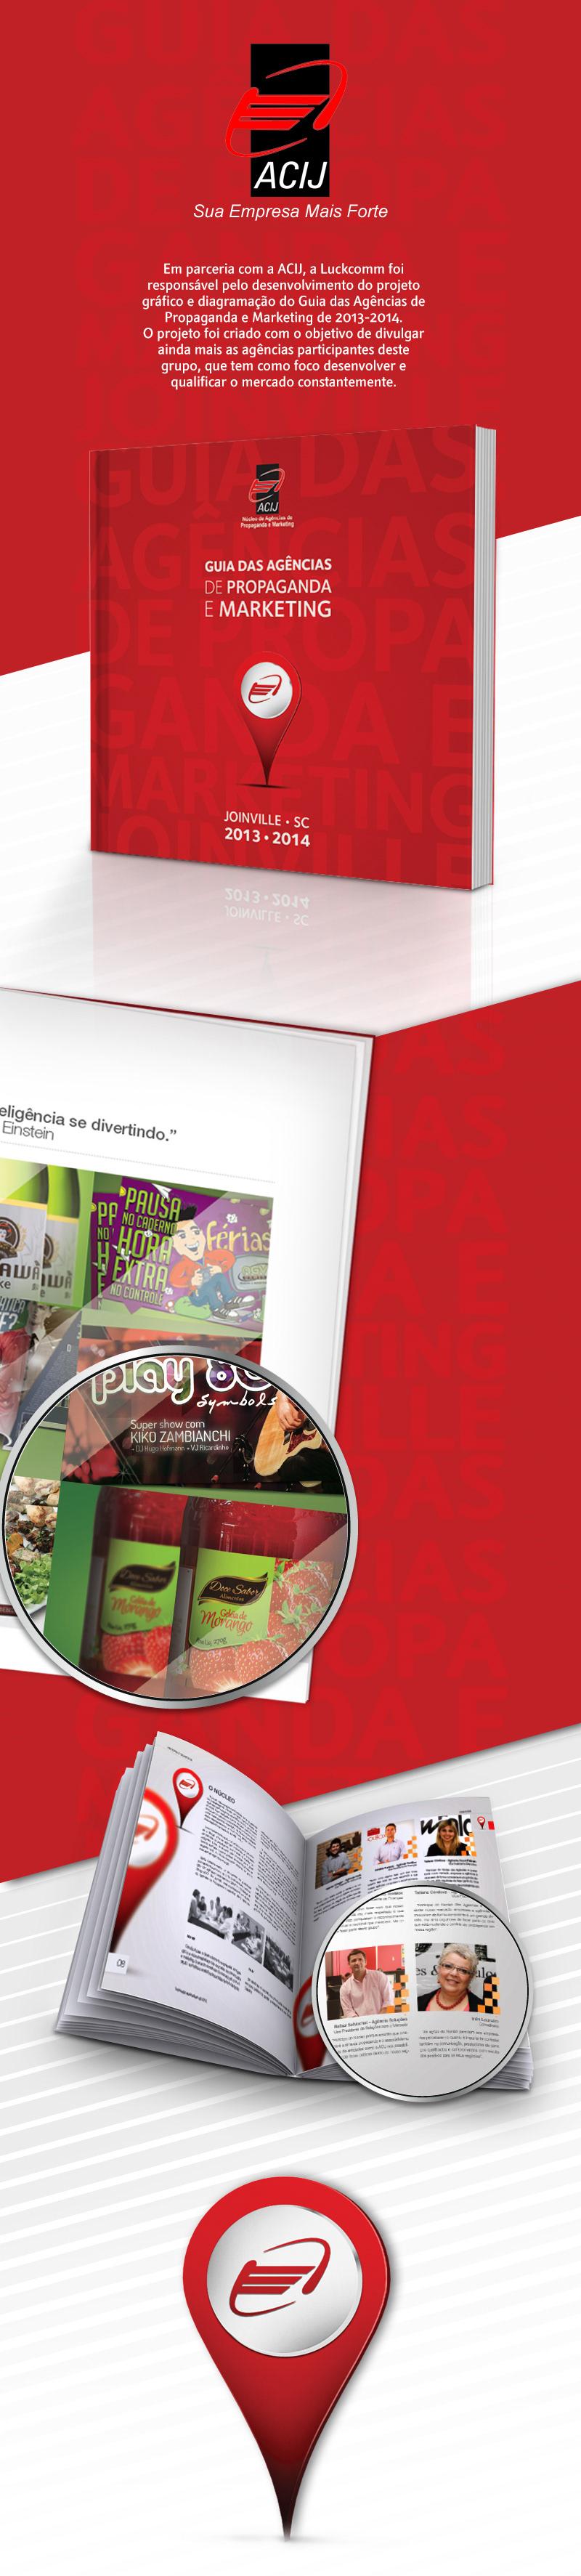 luckcomm design acij editorial